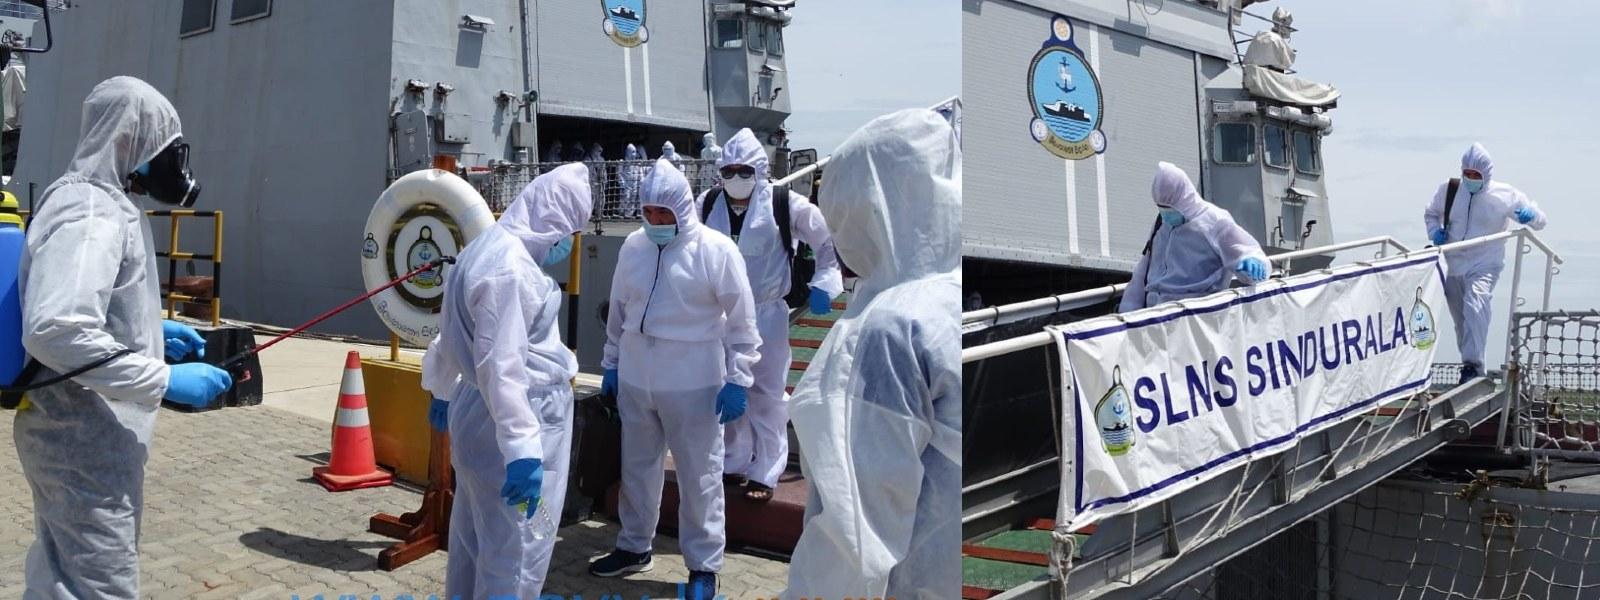 MT New Diamond Crew transferred to Hambantota Port, will be quarantined in Galle